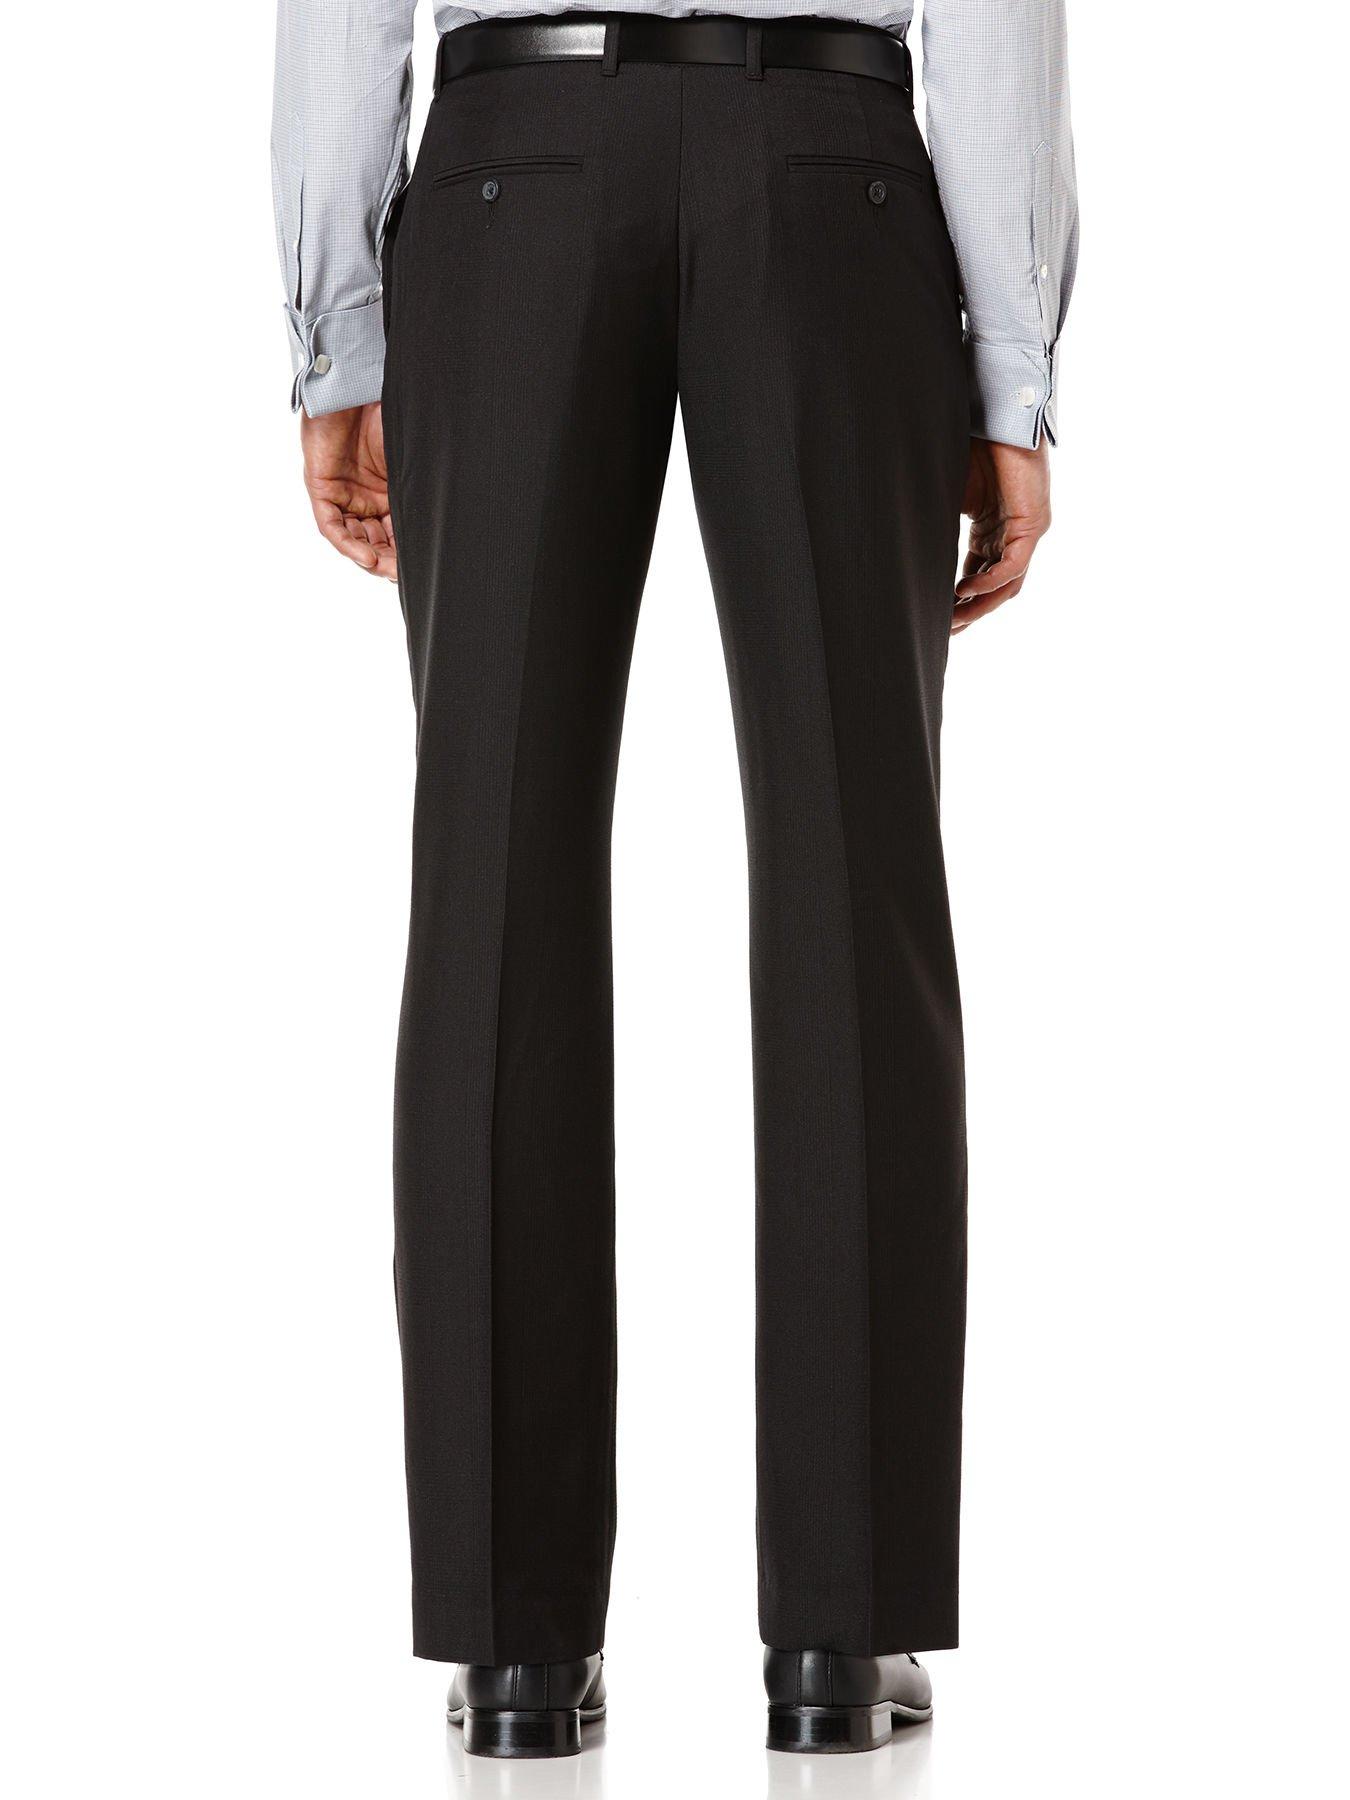 Perry Ellis Travel Luxe Slimfit Dress Pants In Black For